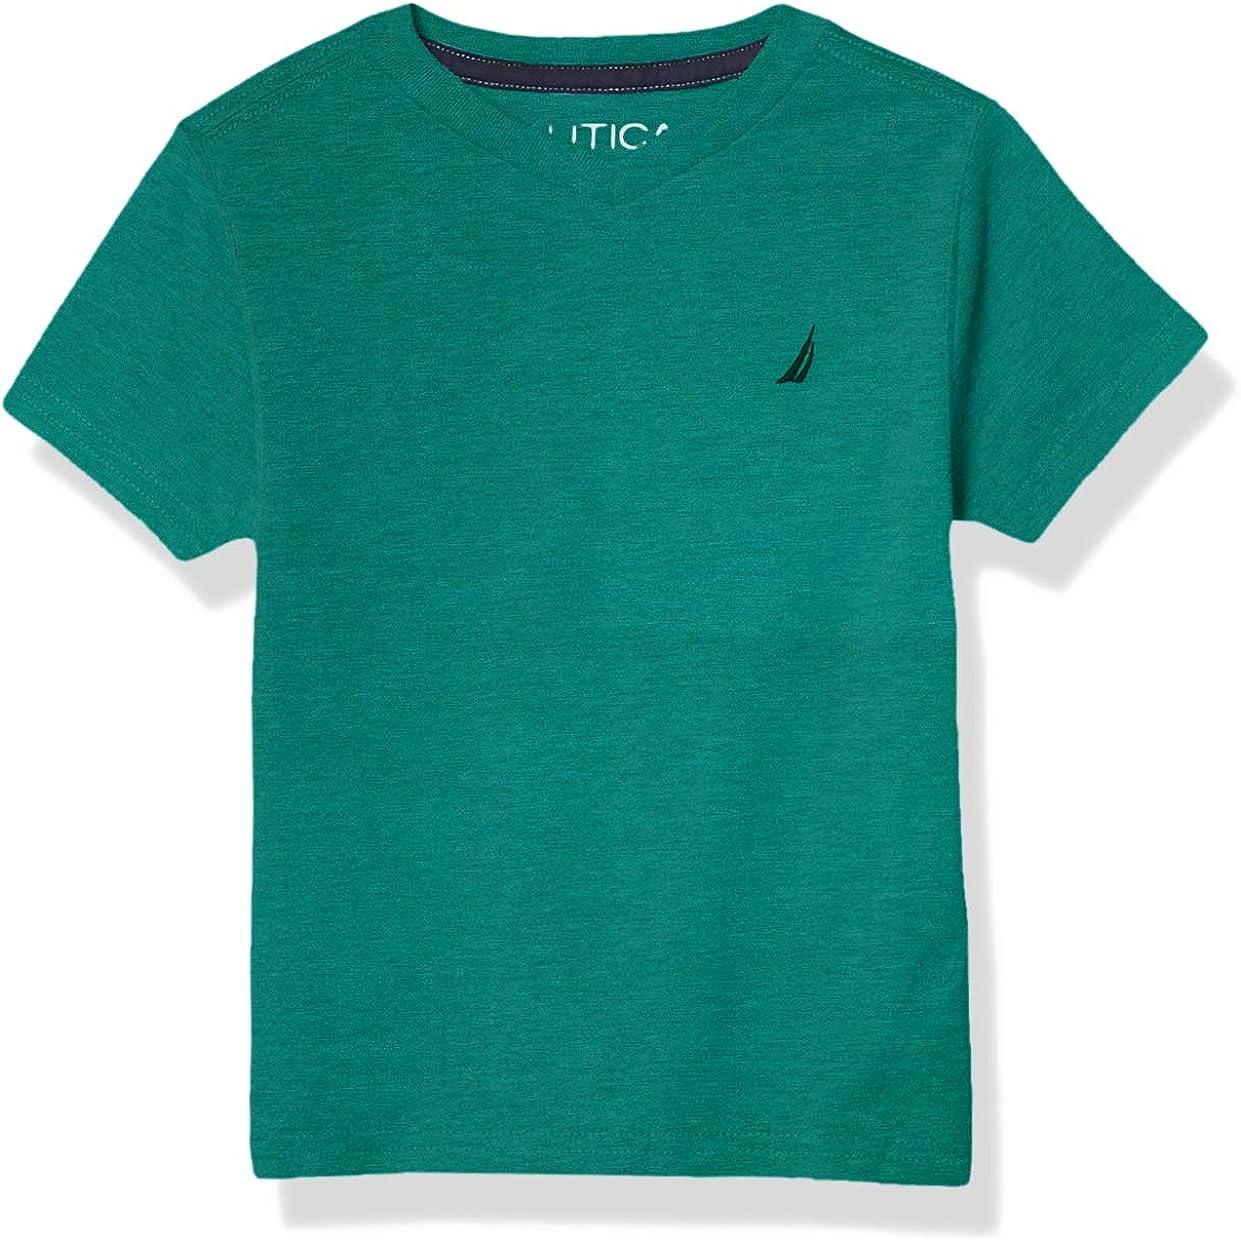 Nautica Boys Short Sleeve Solid Heathered V-Neck Tee